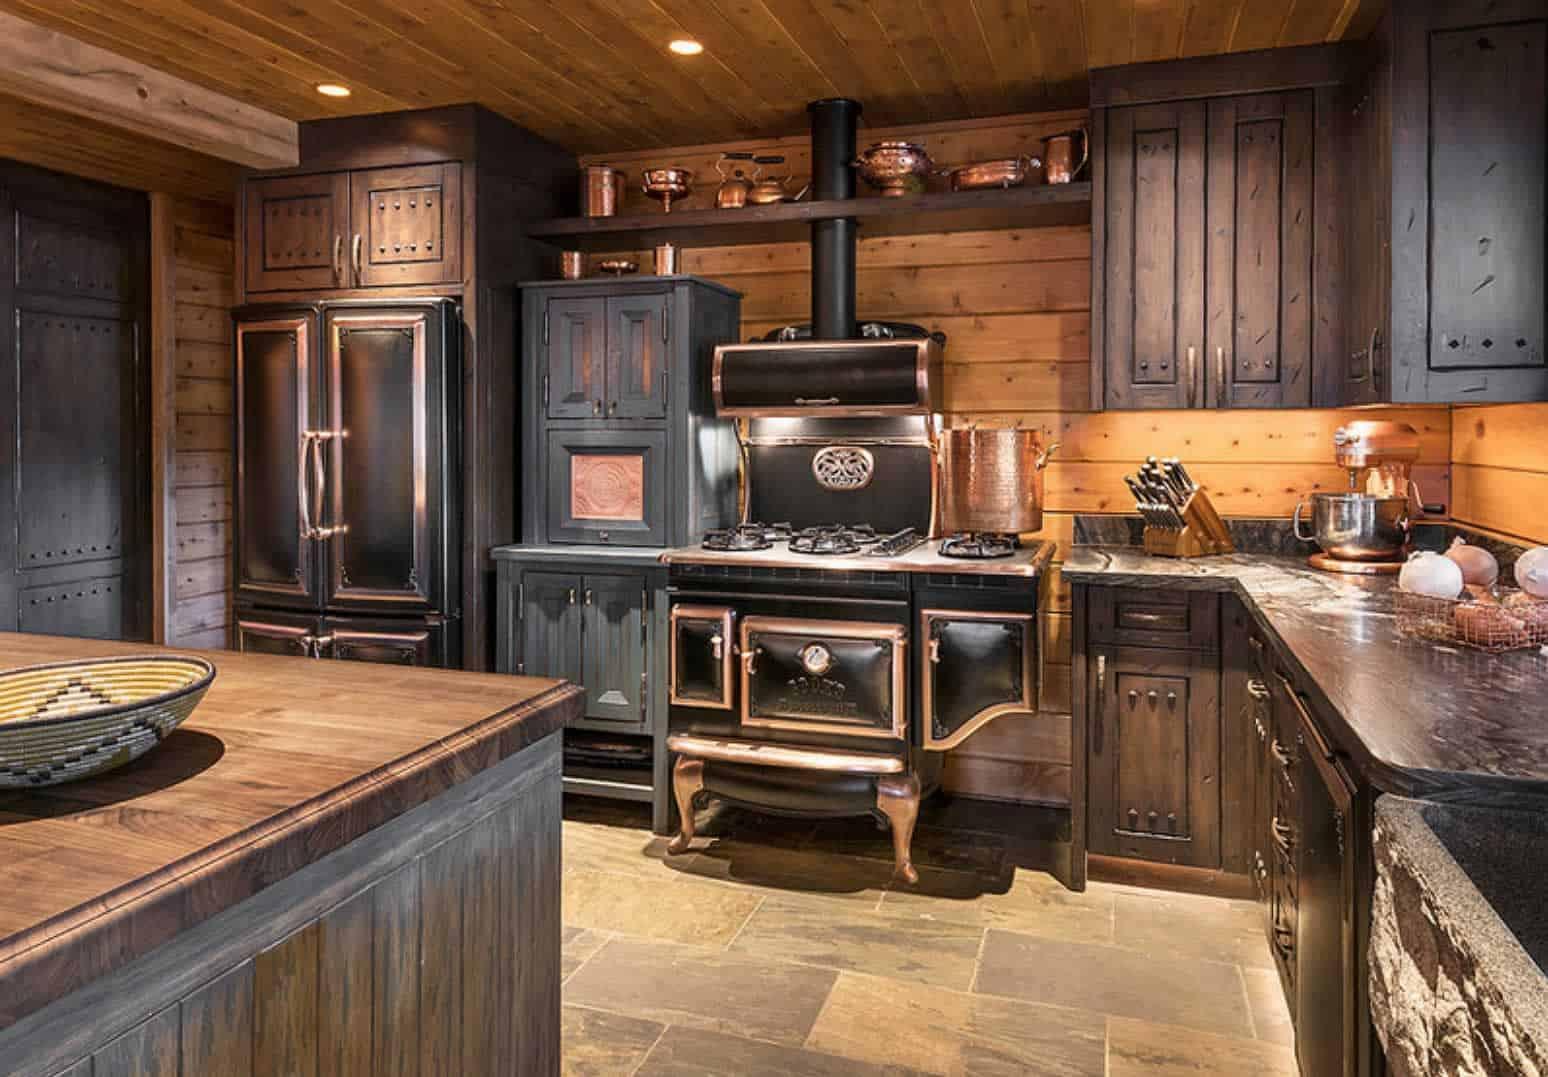 Elmira Stove Works Antique Kitchen